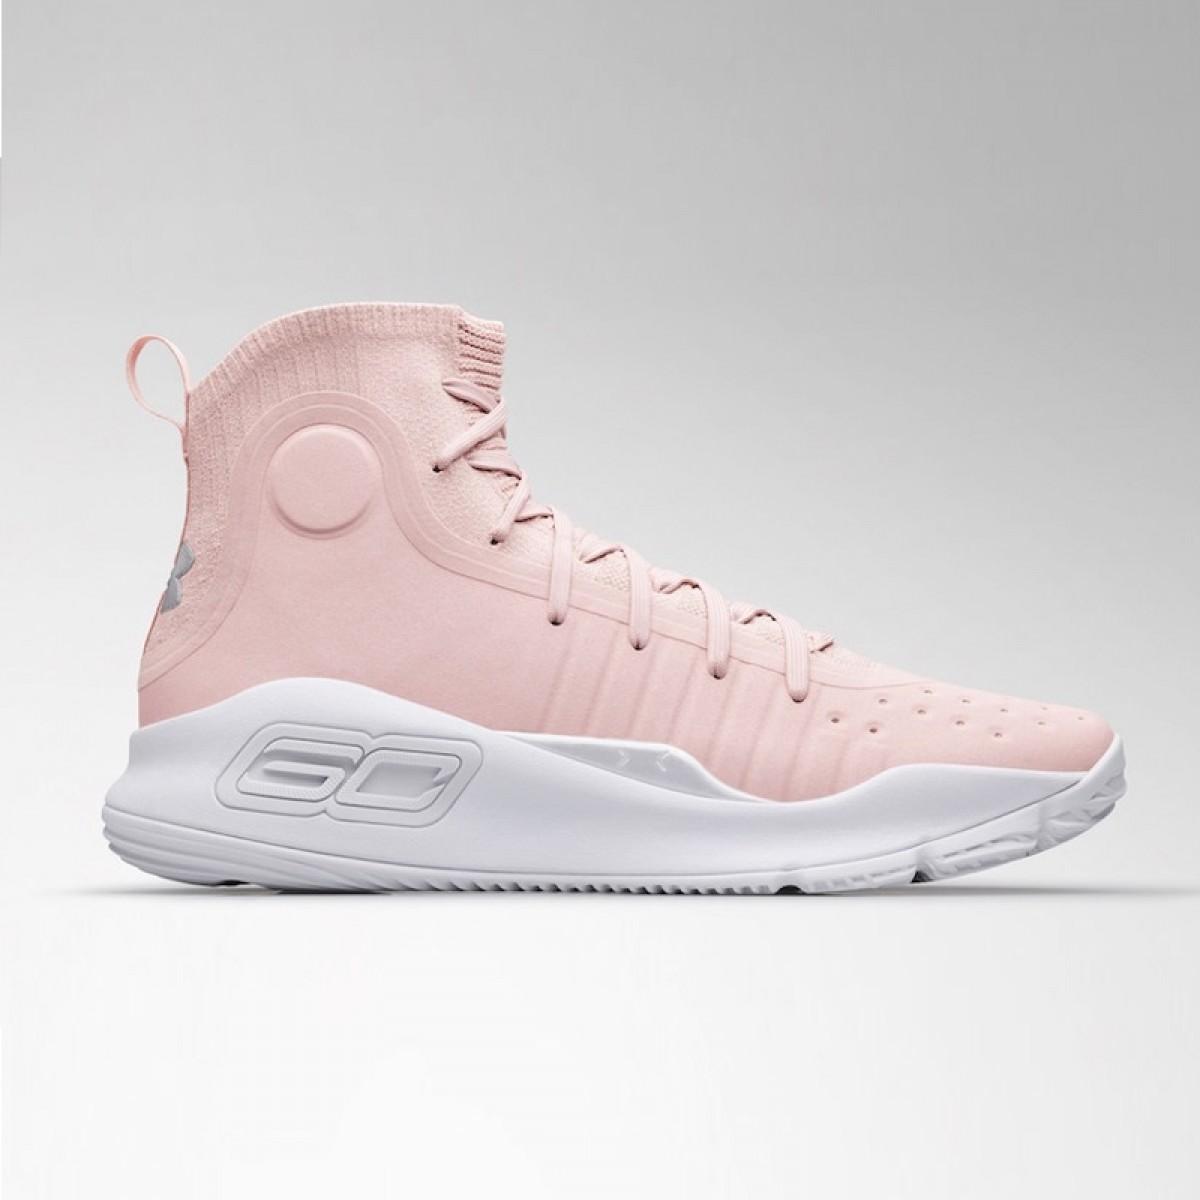 UA Curry 4 'Flushed Pink'